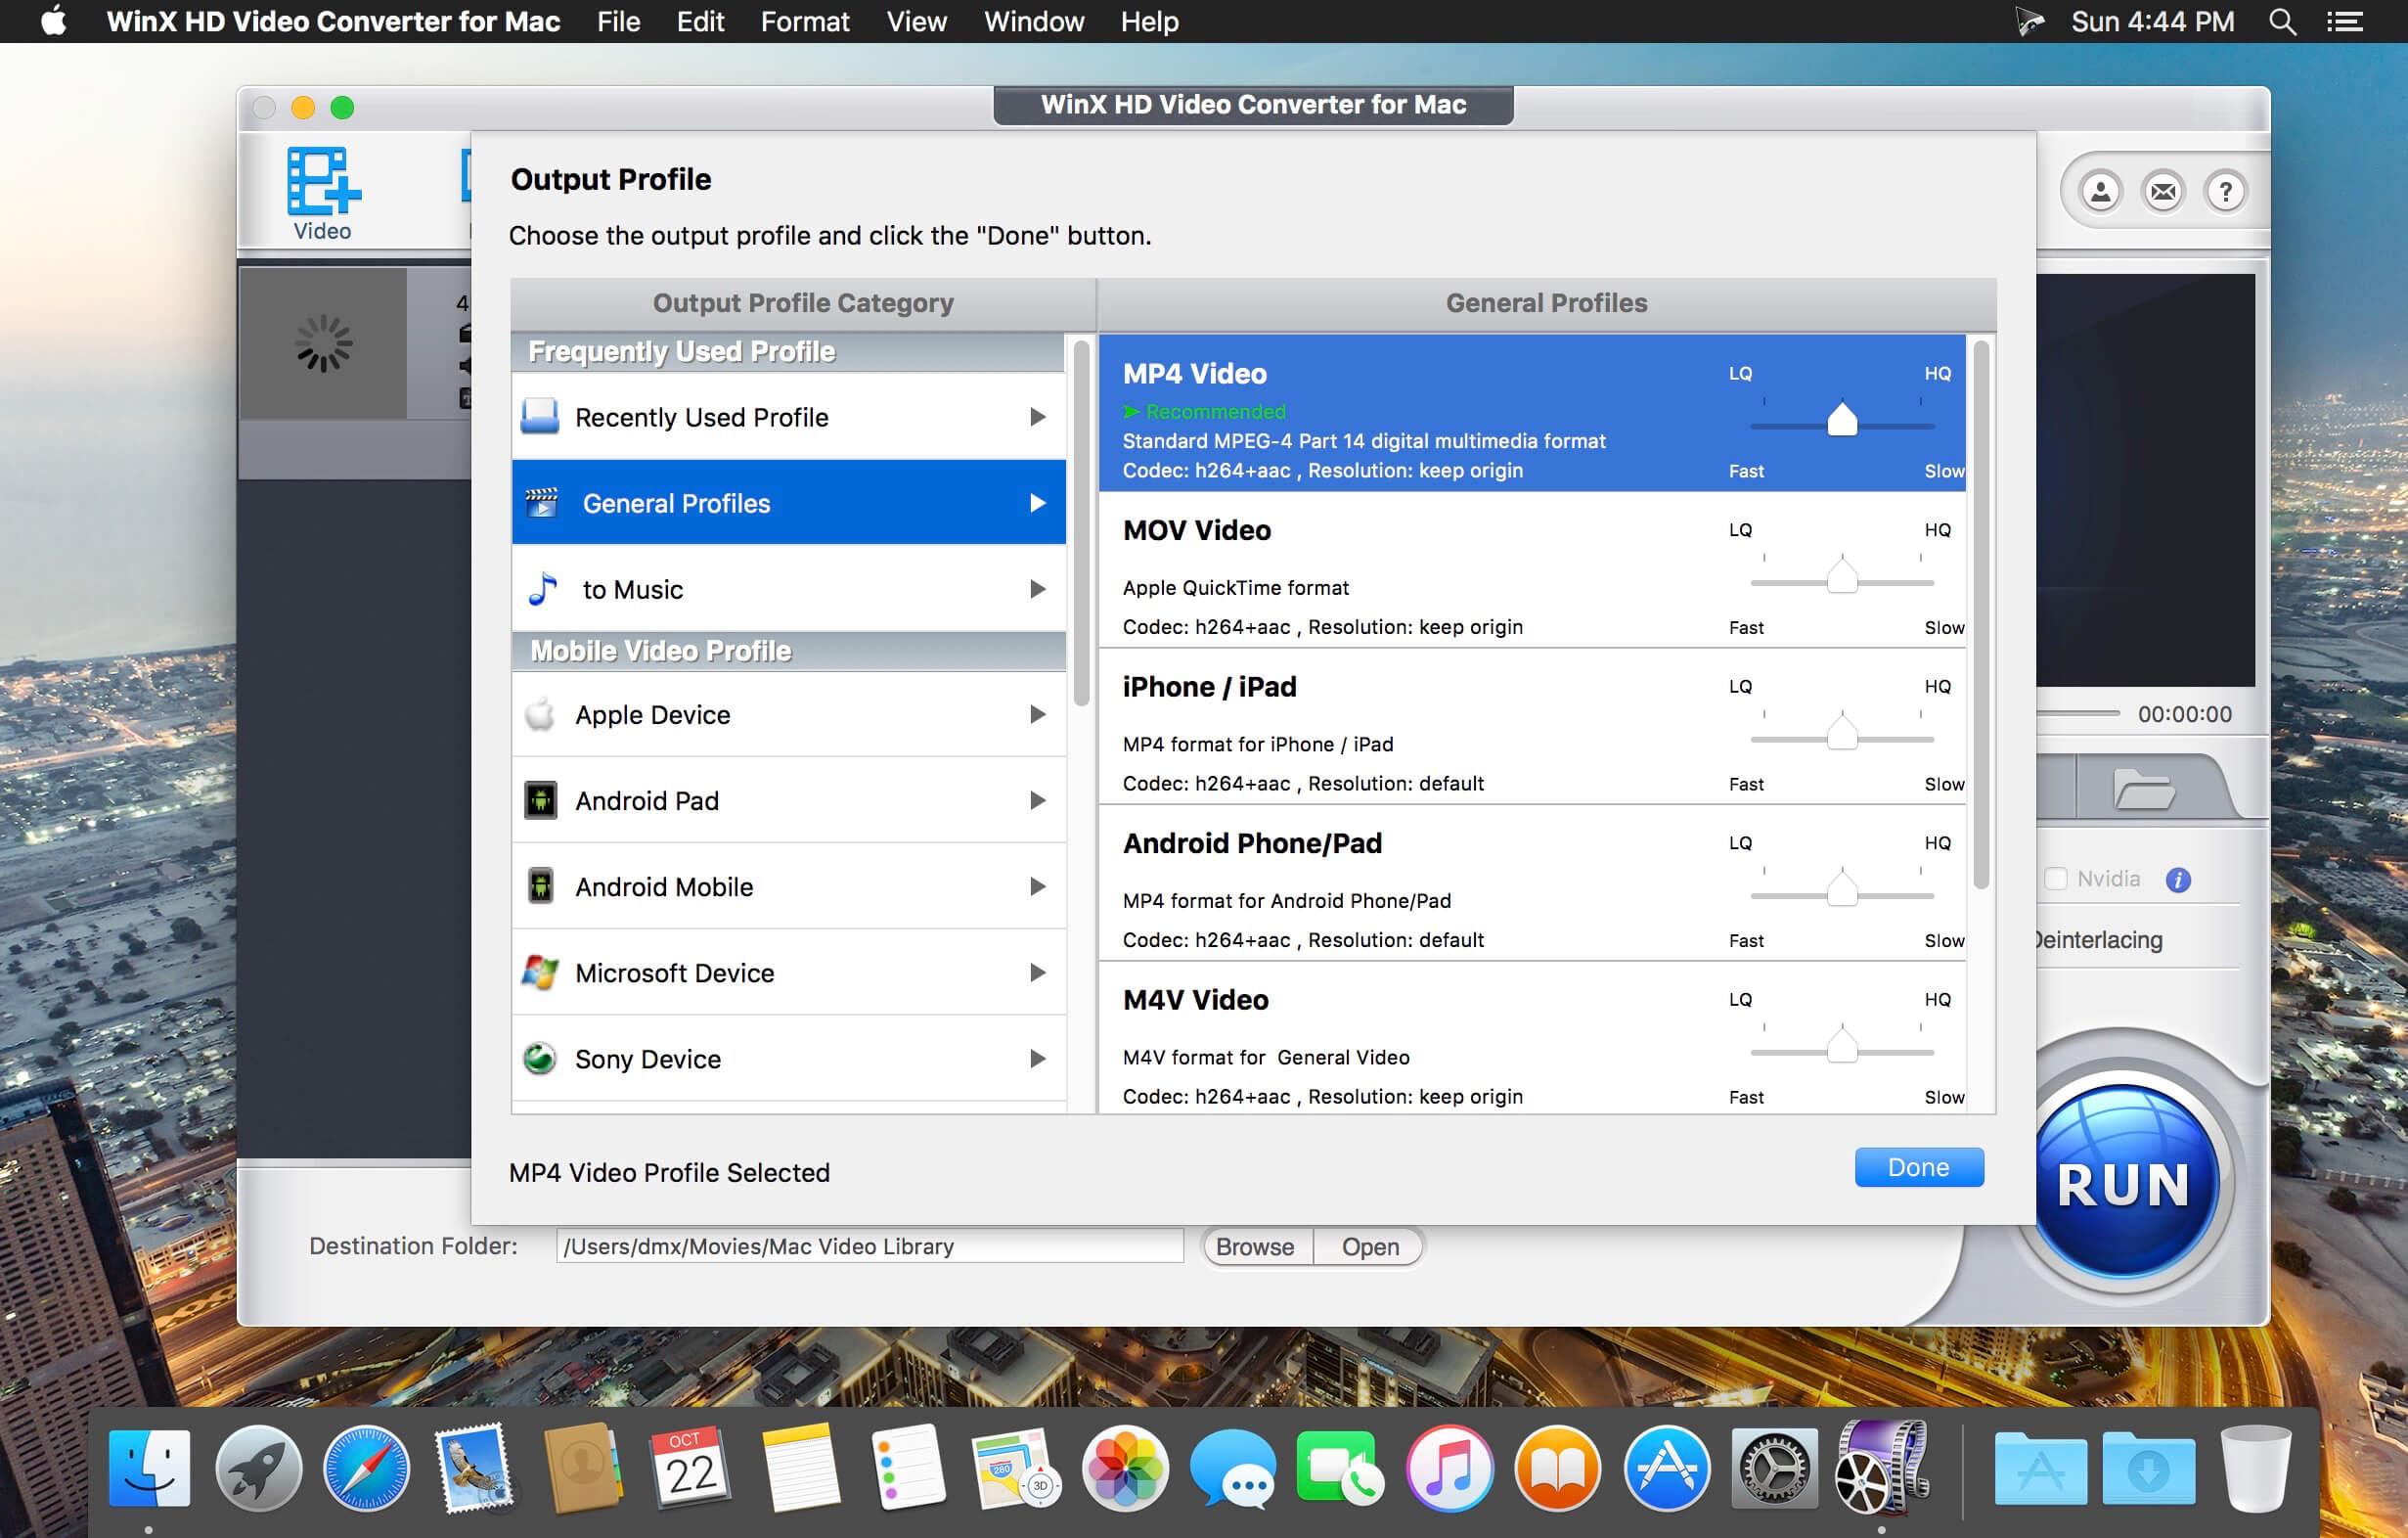 WinX-HD-Video-Converter-6.5.2-for-Mac-Torrent